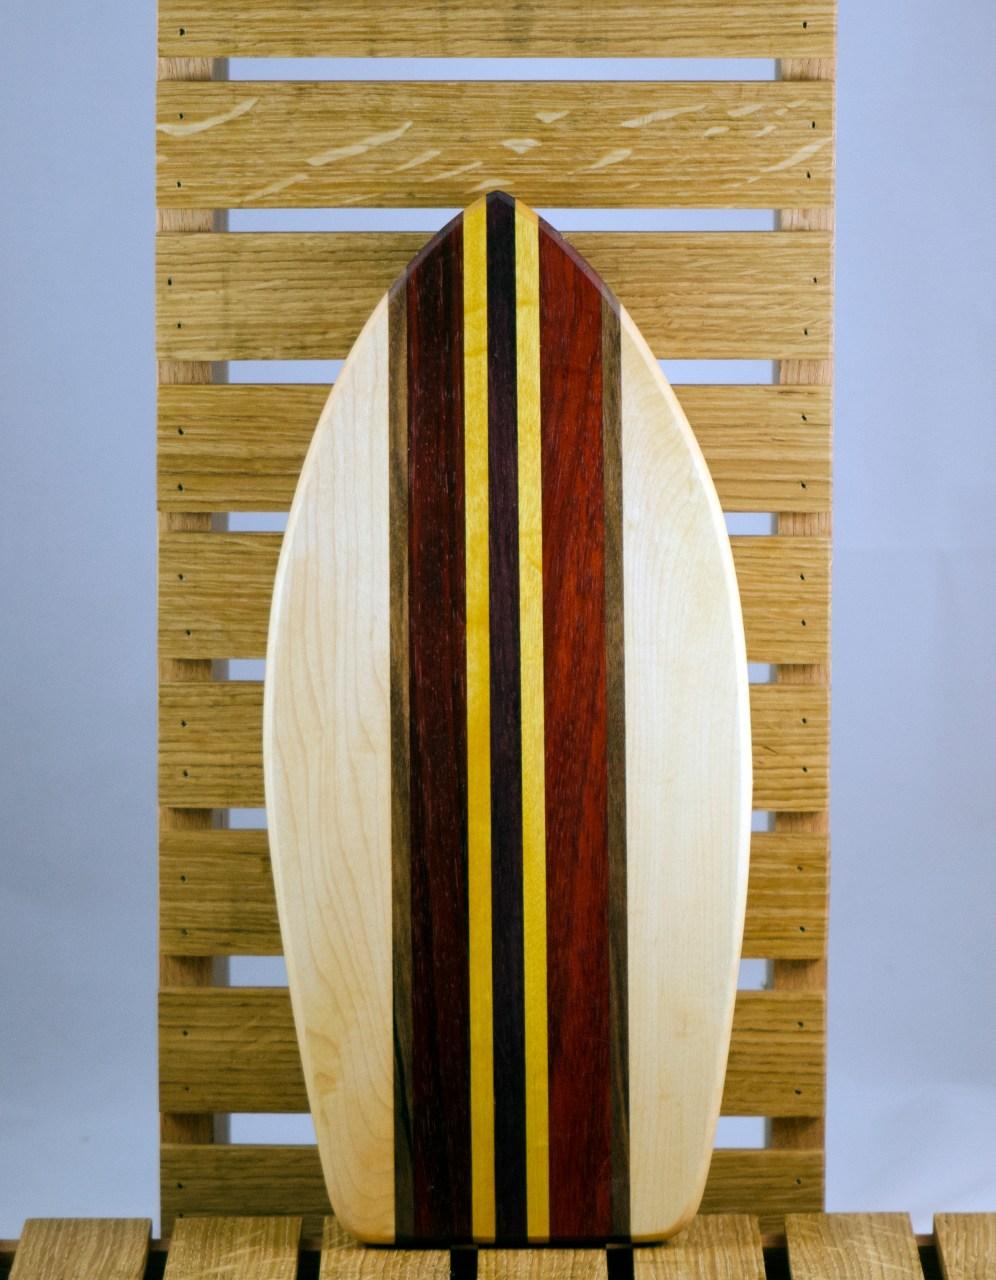 Small Surfboard 16 - 08. Hard Maple, Black Walnut, Padauk & Yellowheart.